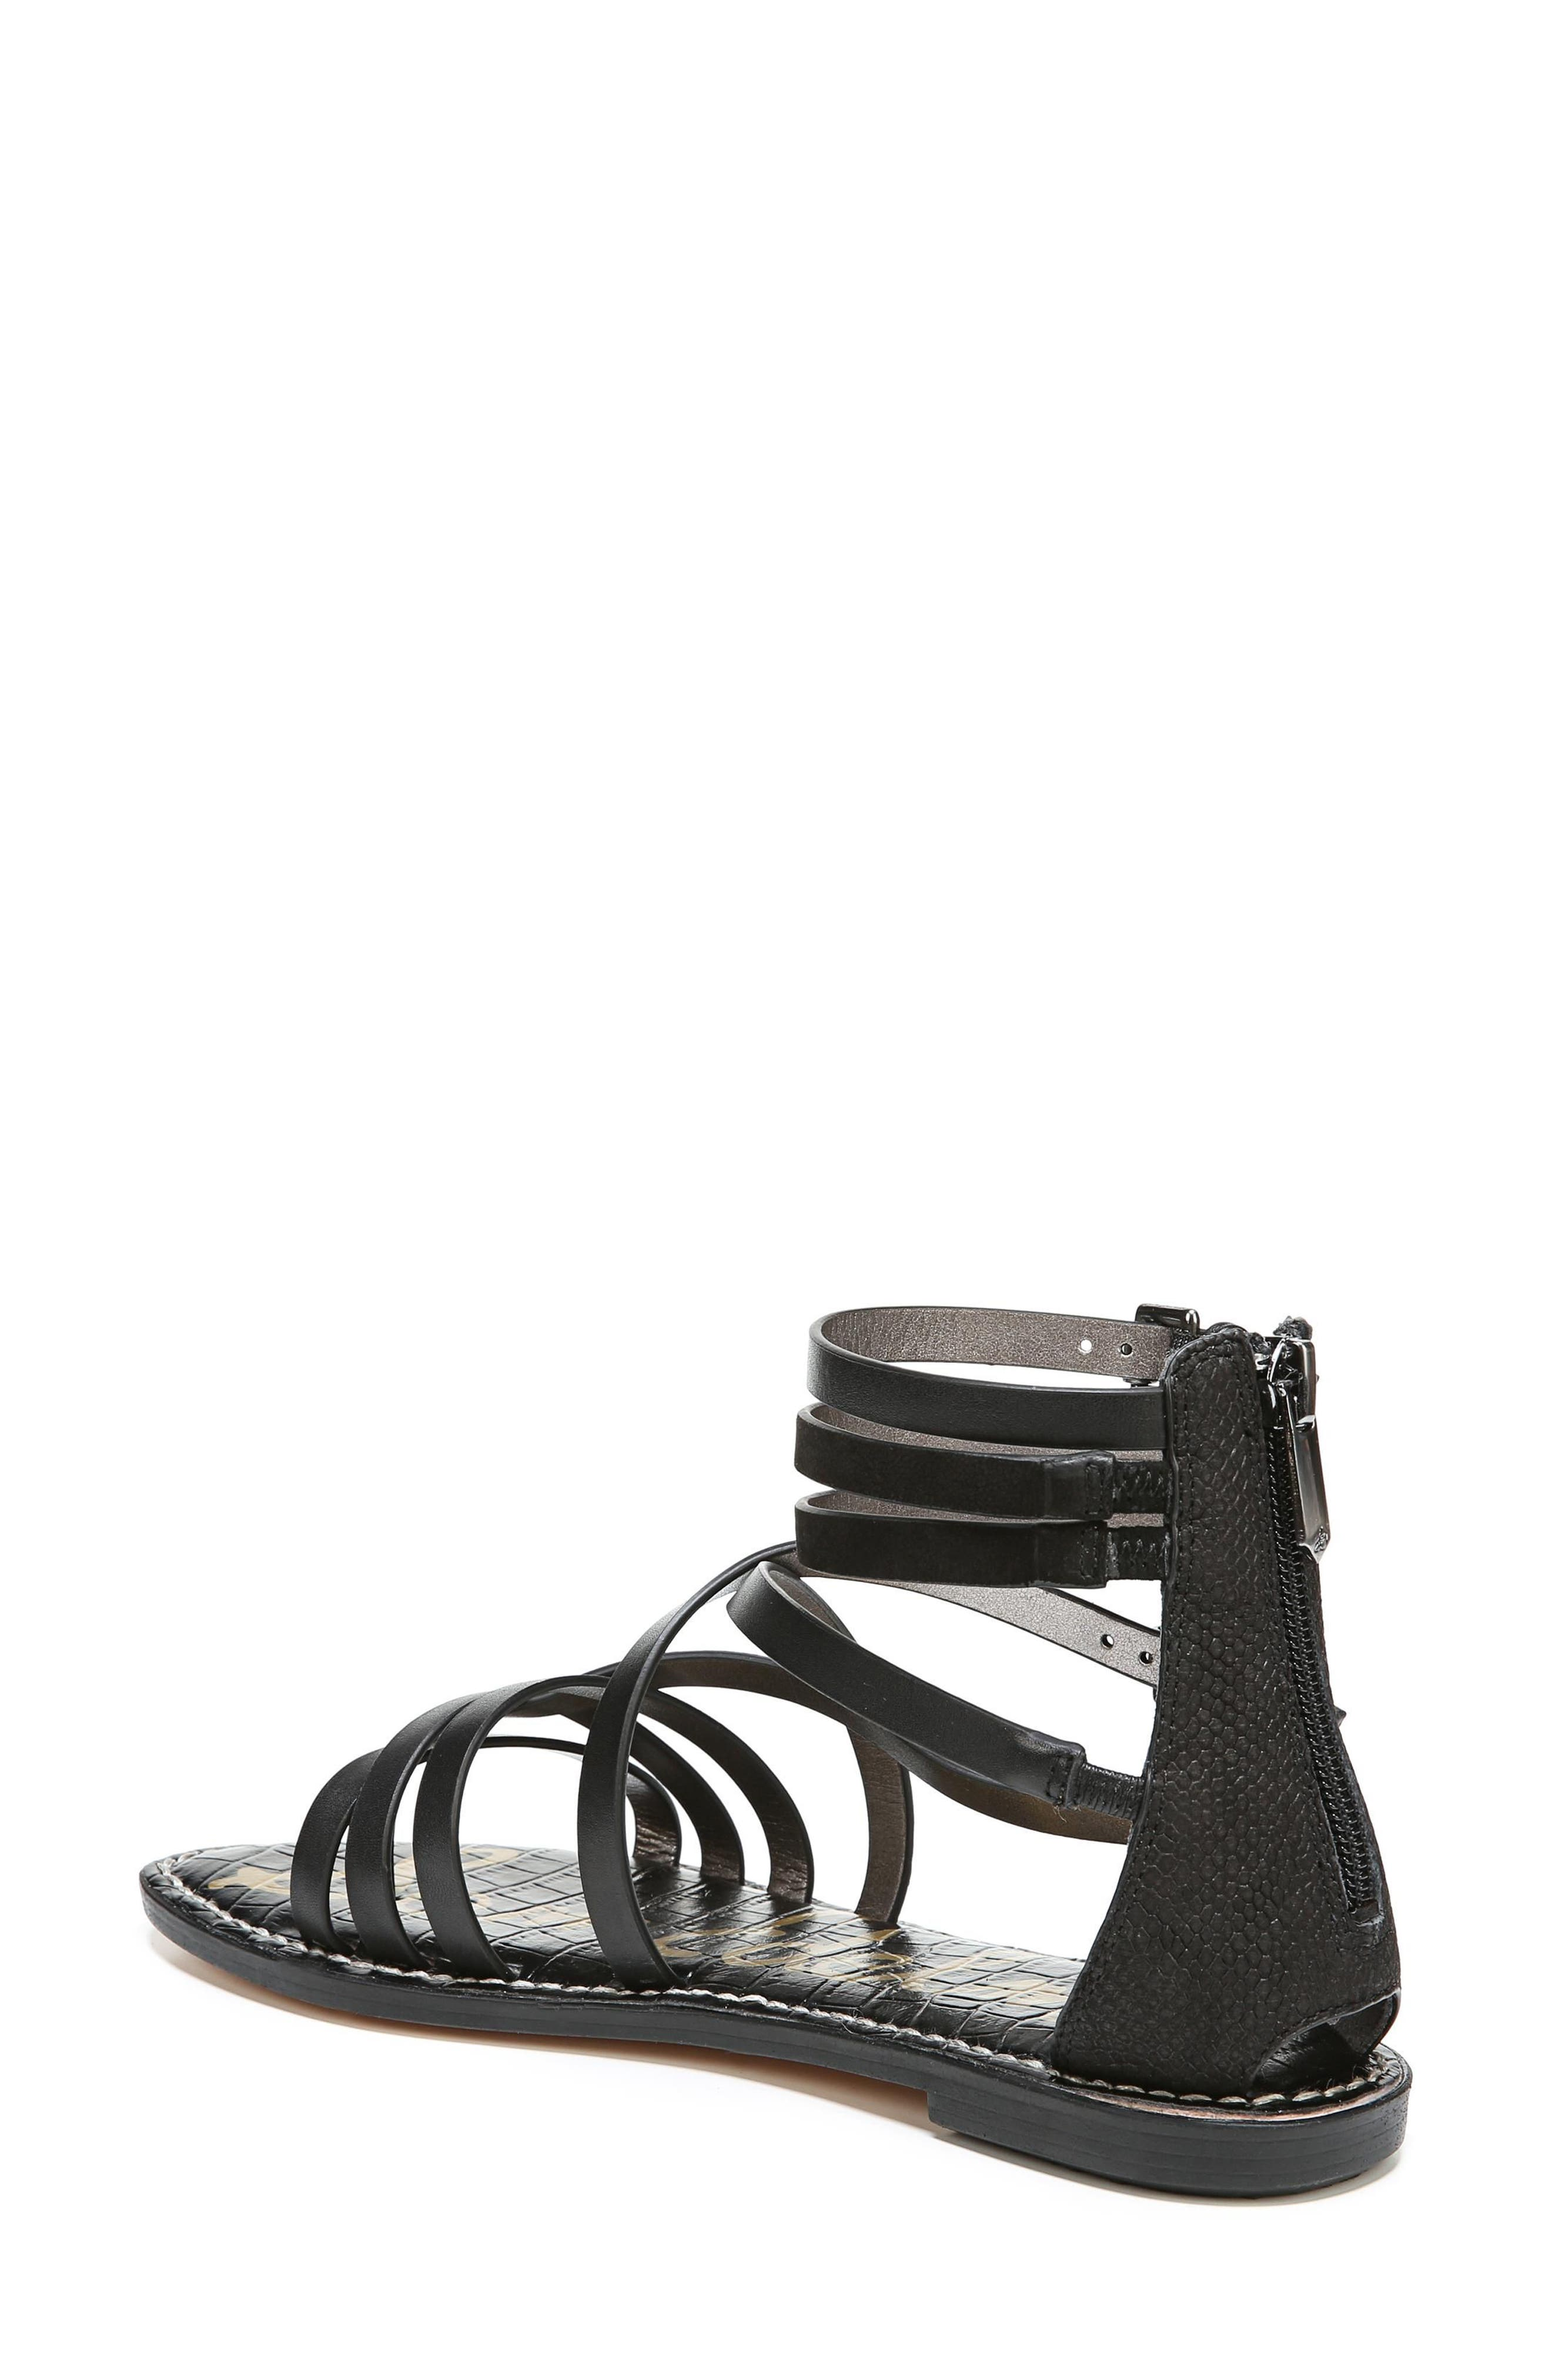 Ganesa Strappy Sandal,                             Alternate thumbnail 2, color,                             BLACK LEATHER